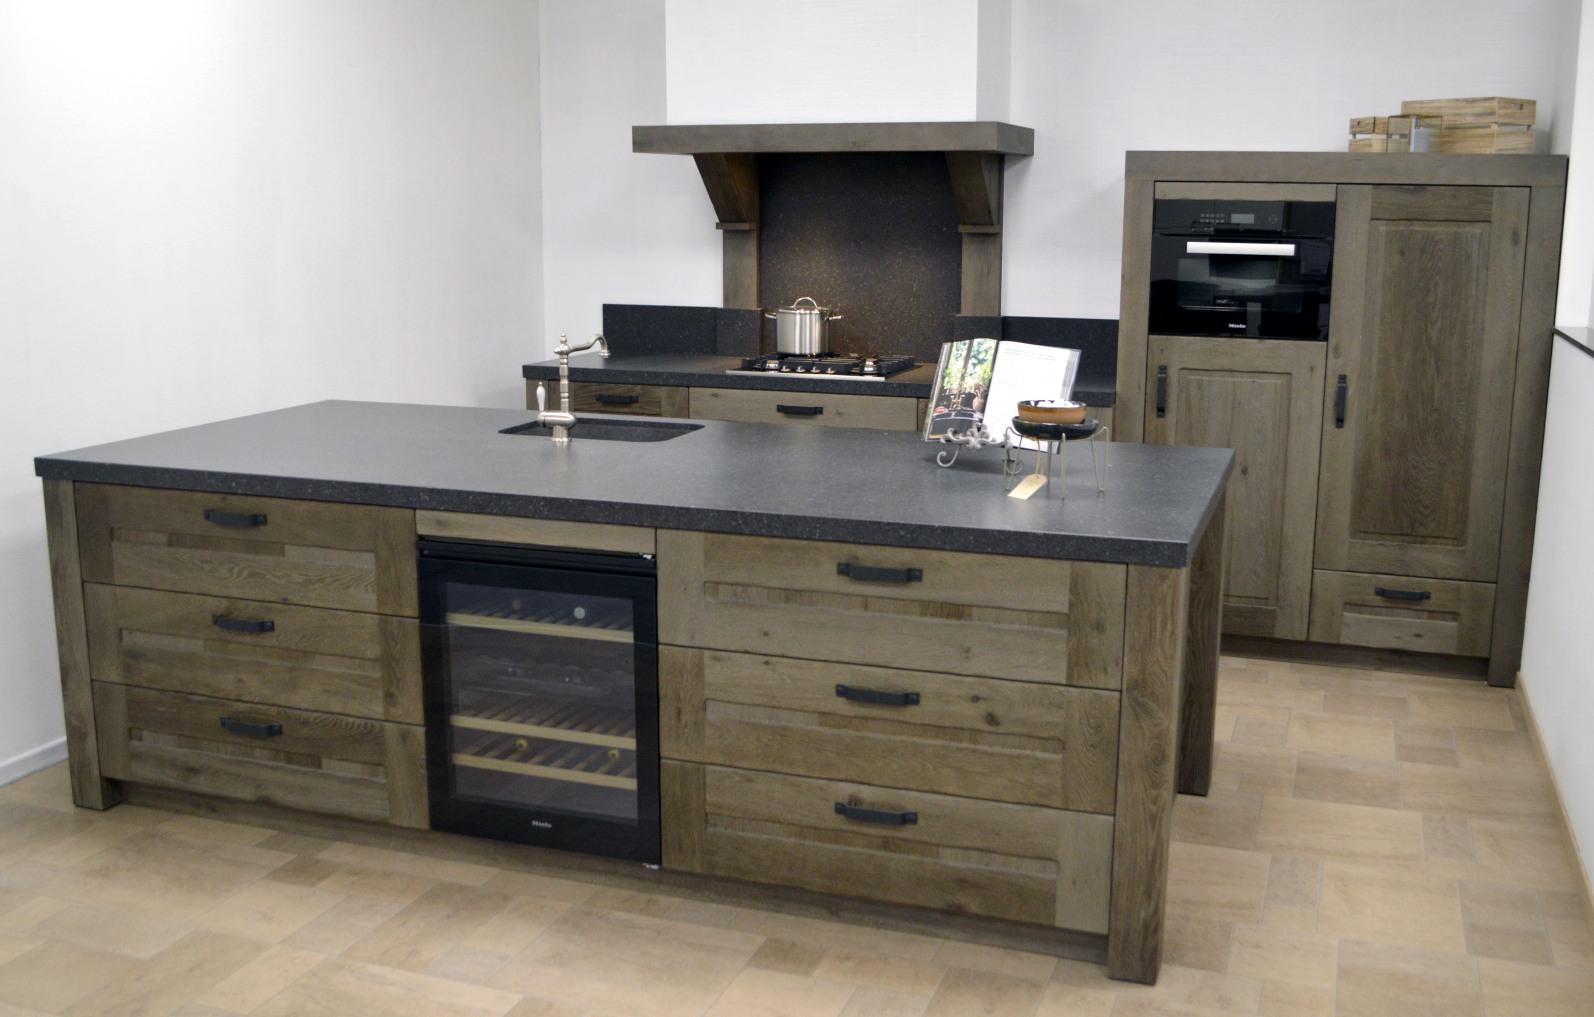 Landelijke keuken in donker hout met keukeneiland - ACK Keukens